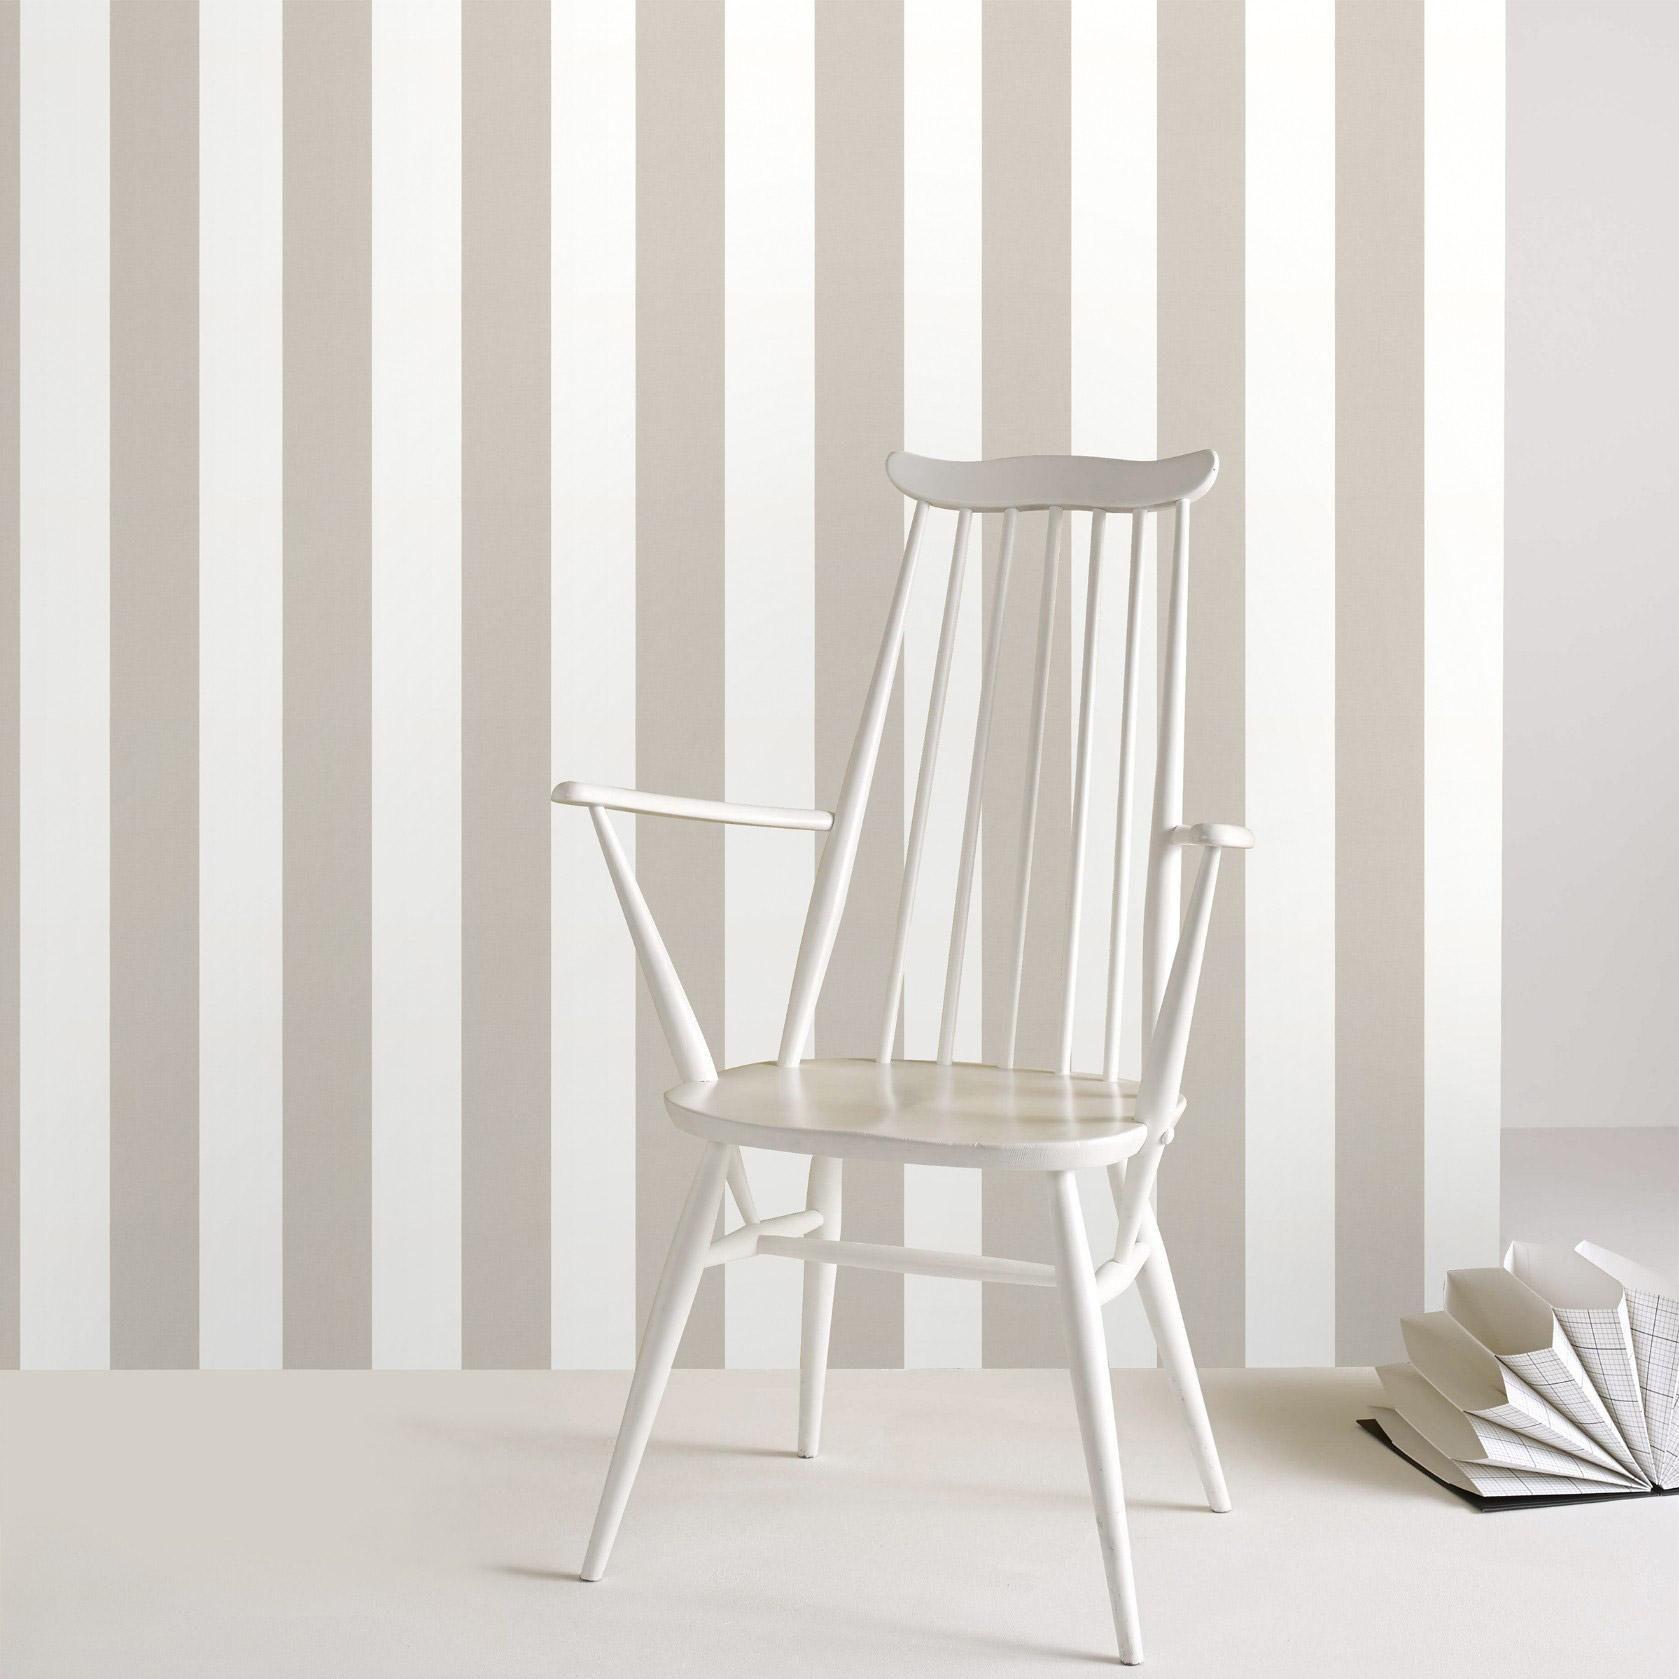 Papier peint vinyle Rayures moyennes blanc/taupe | Papier peint vinyle, Papier peint, Décoration ...